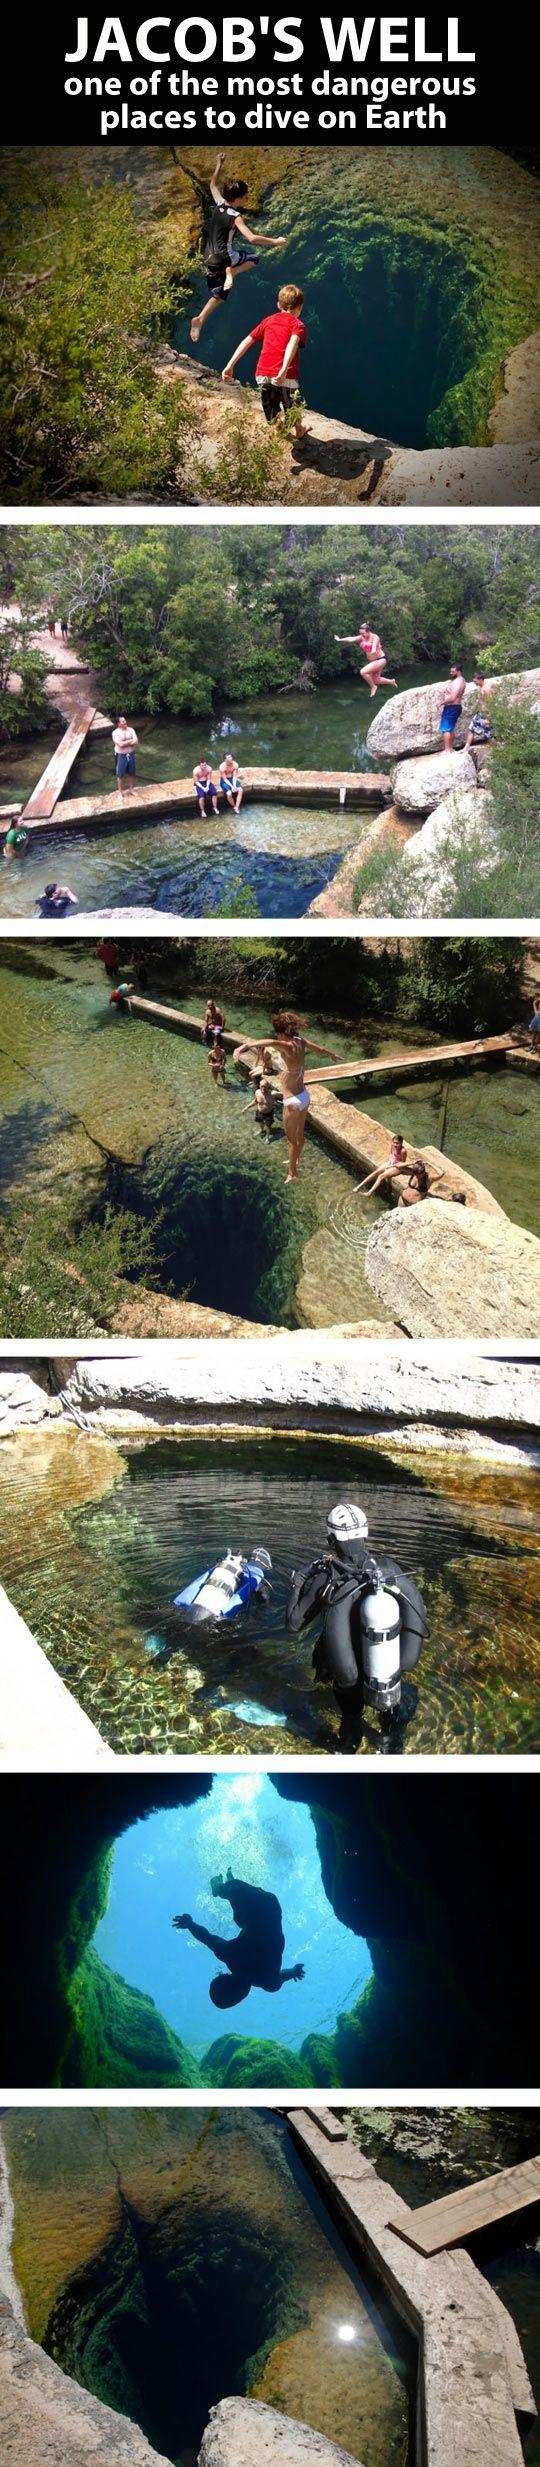 Jacob's Well, Texas: